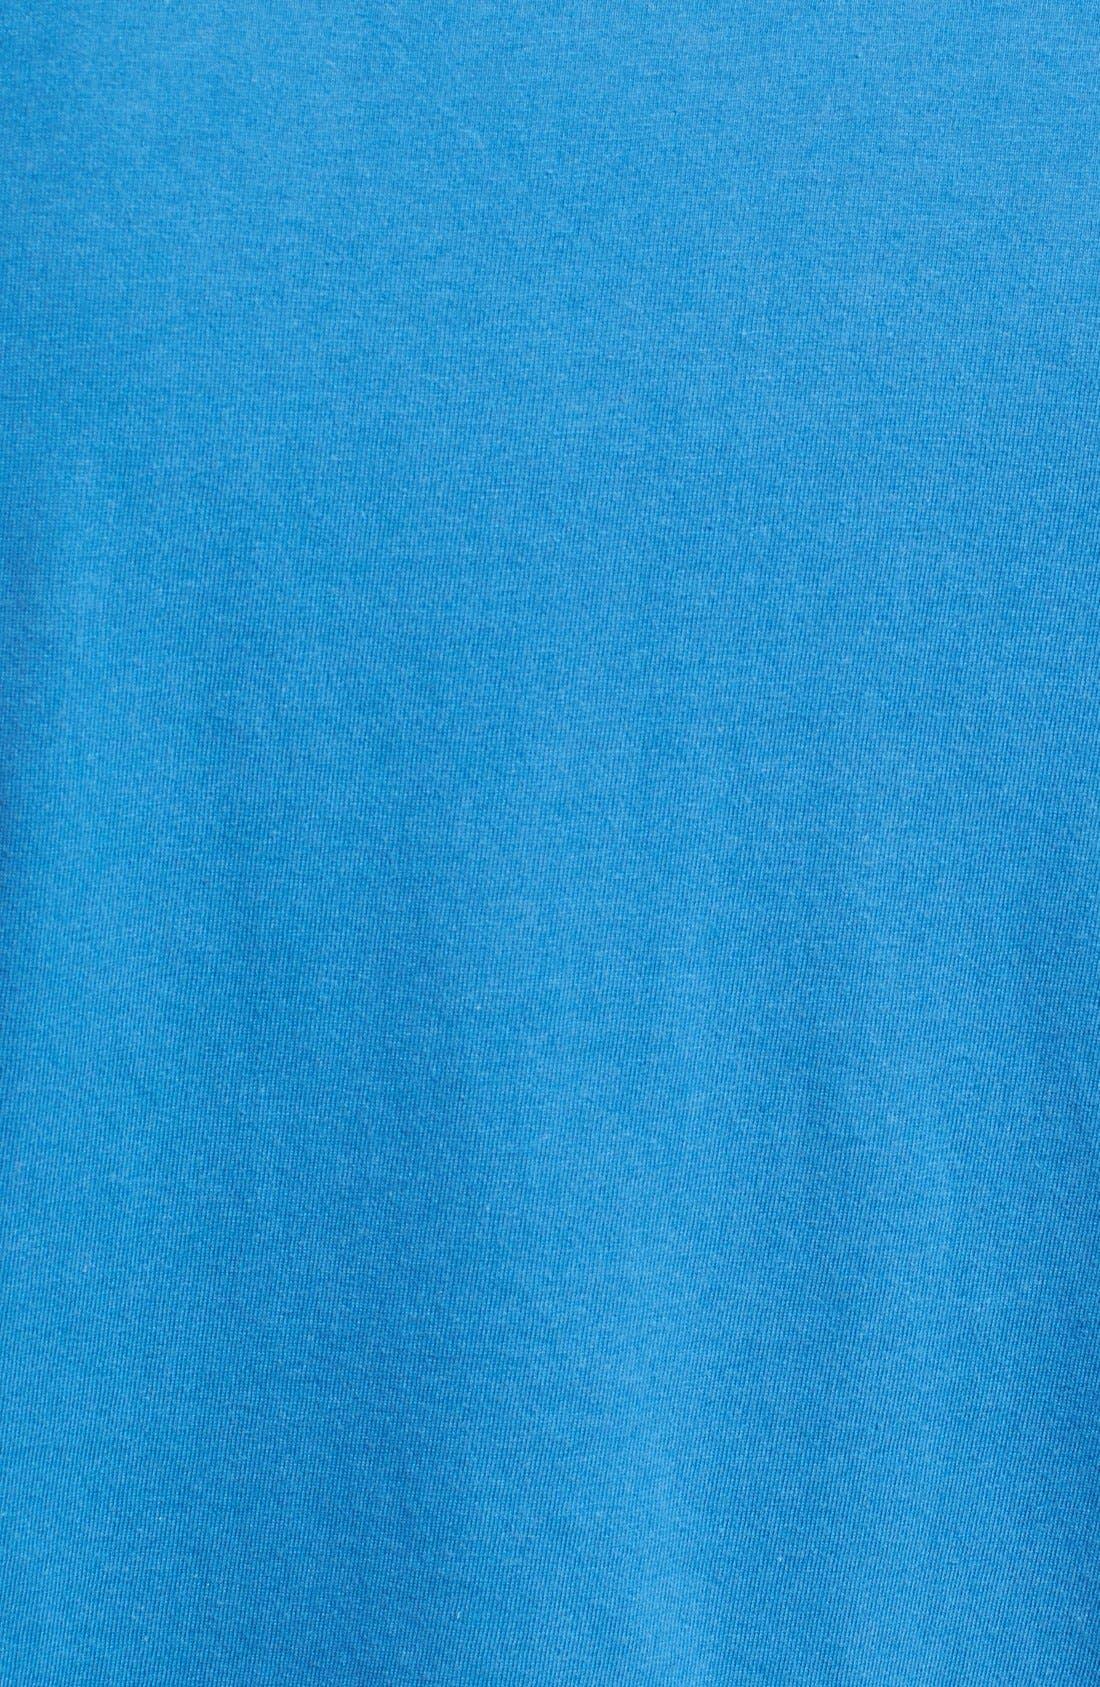 'Toronto Maple Leafs' T-Shirt,                             Alternate thumbnail 3, color,                             450